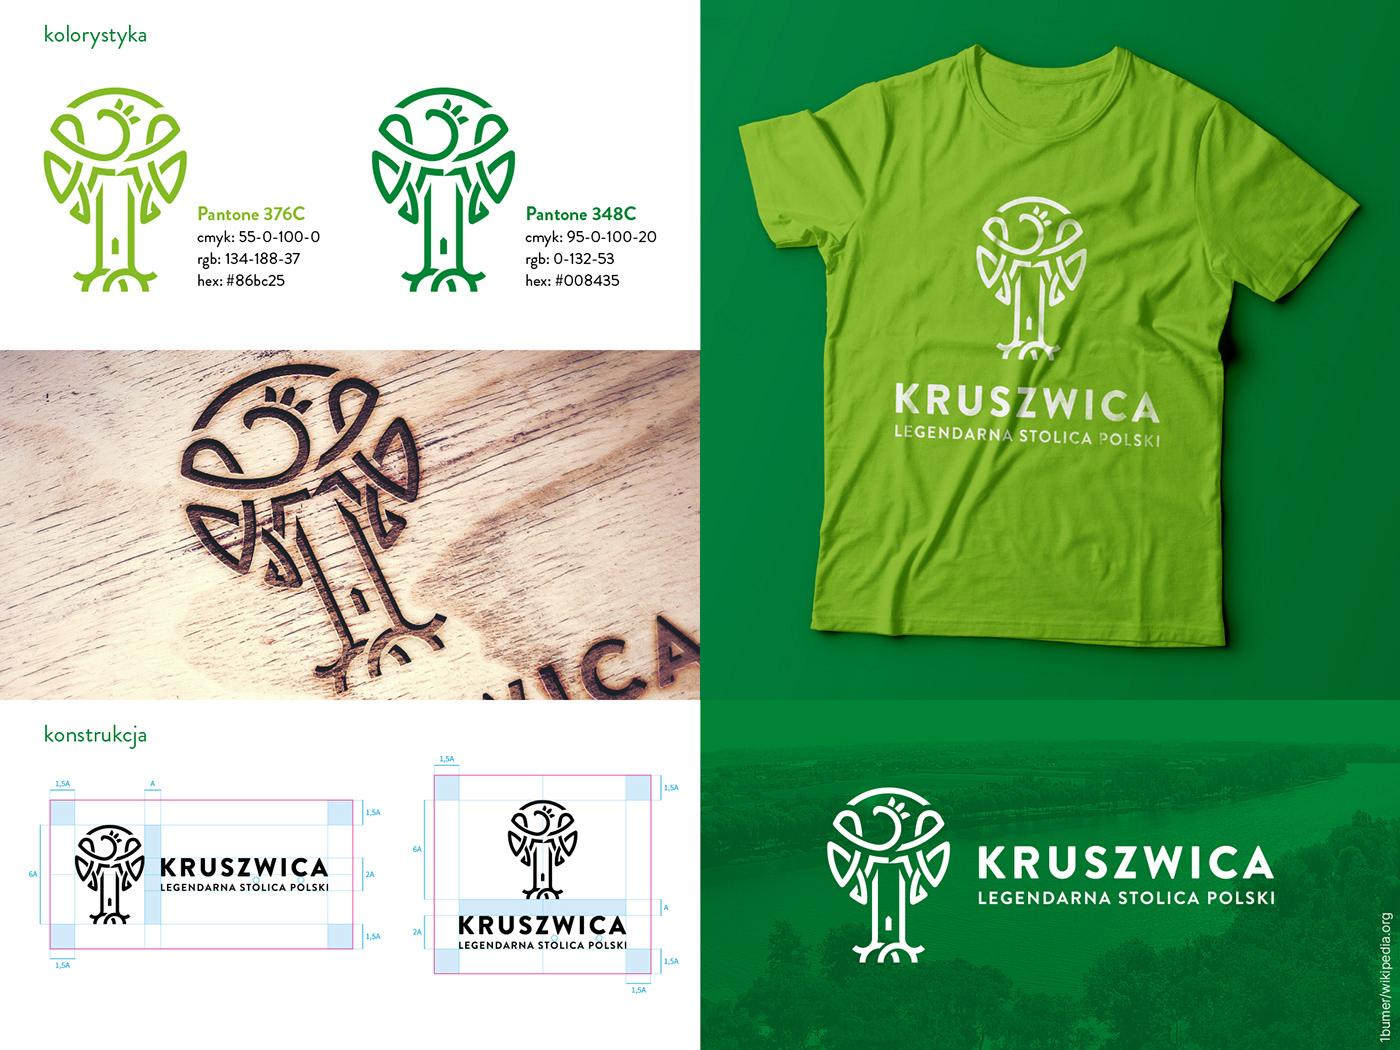 eagle green heritage identity kruszwica logo tower town Tree